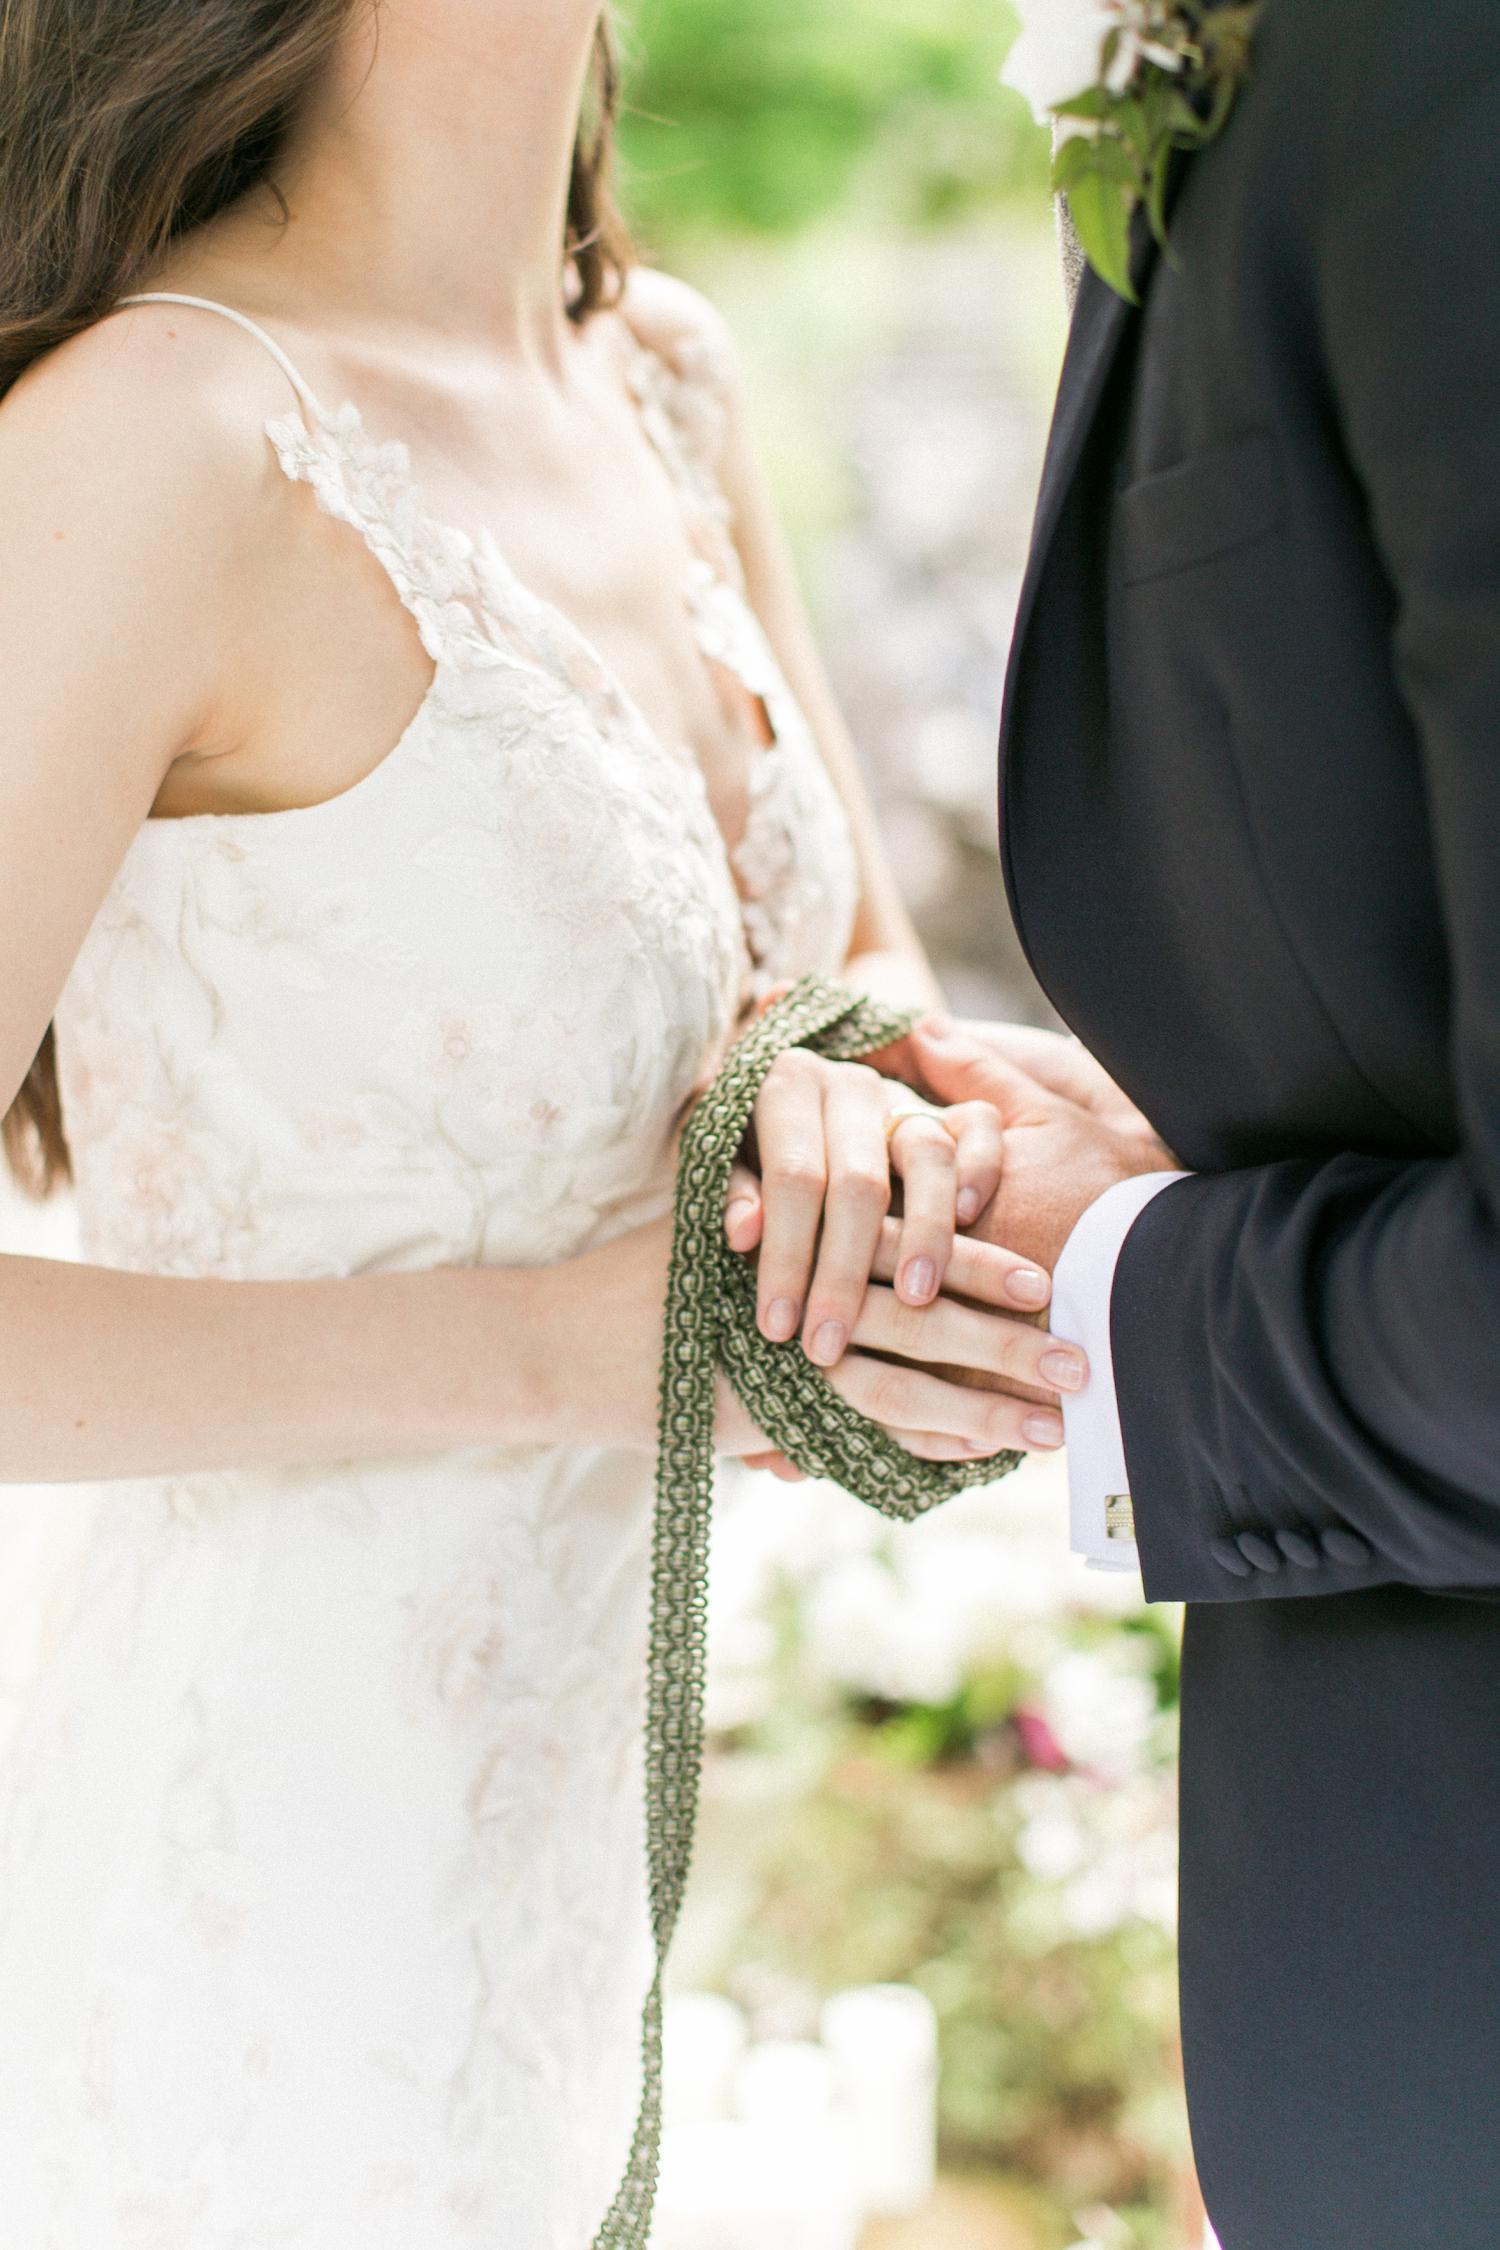 st. patrick's day wedding ideas handfasting ceremony